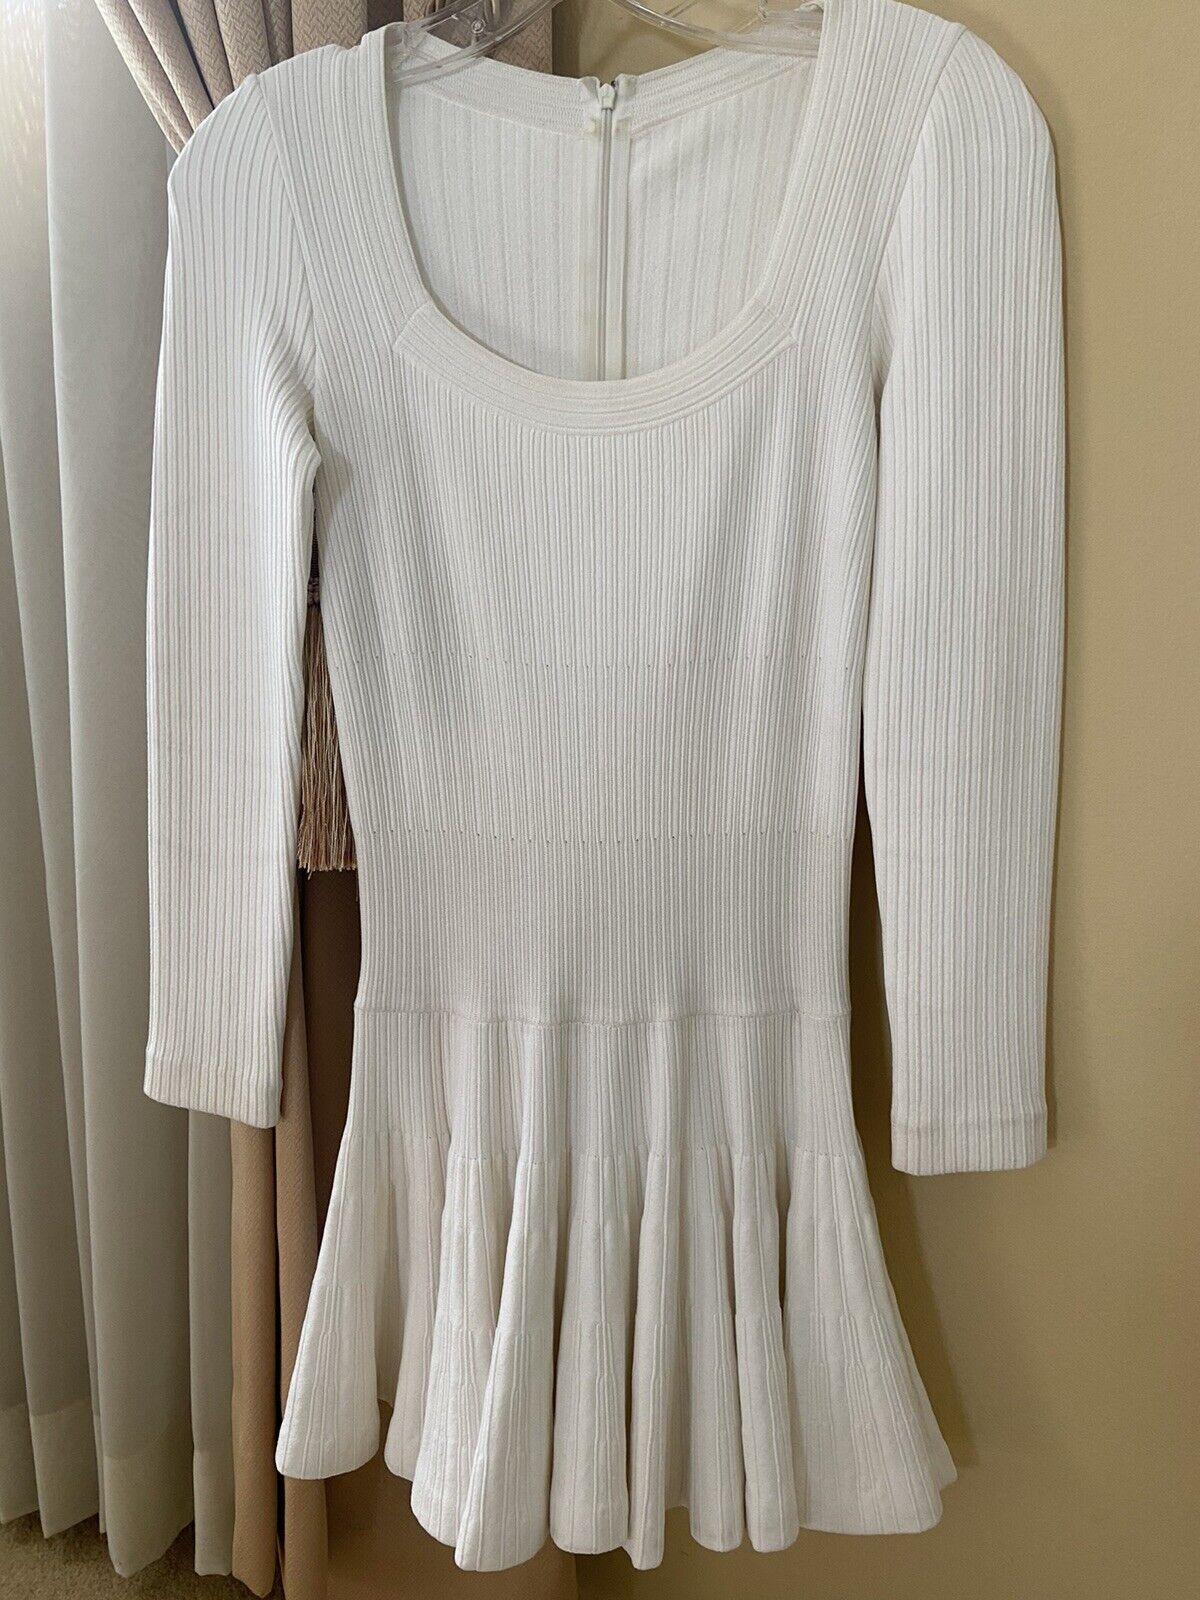 Azzedine Alaia White Long Sleeve Top Blouse Dress… - image 1